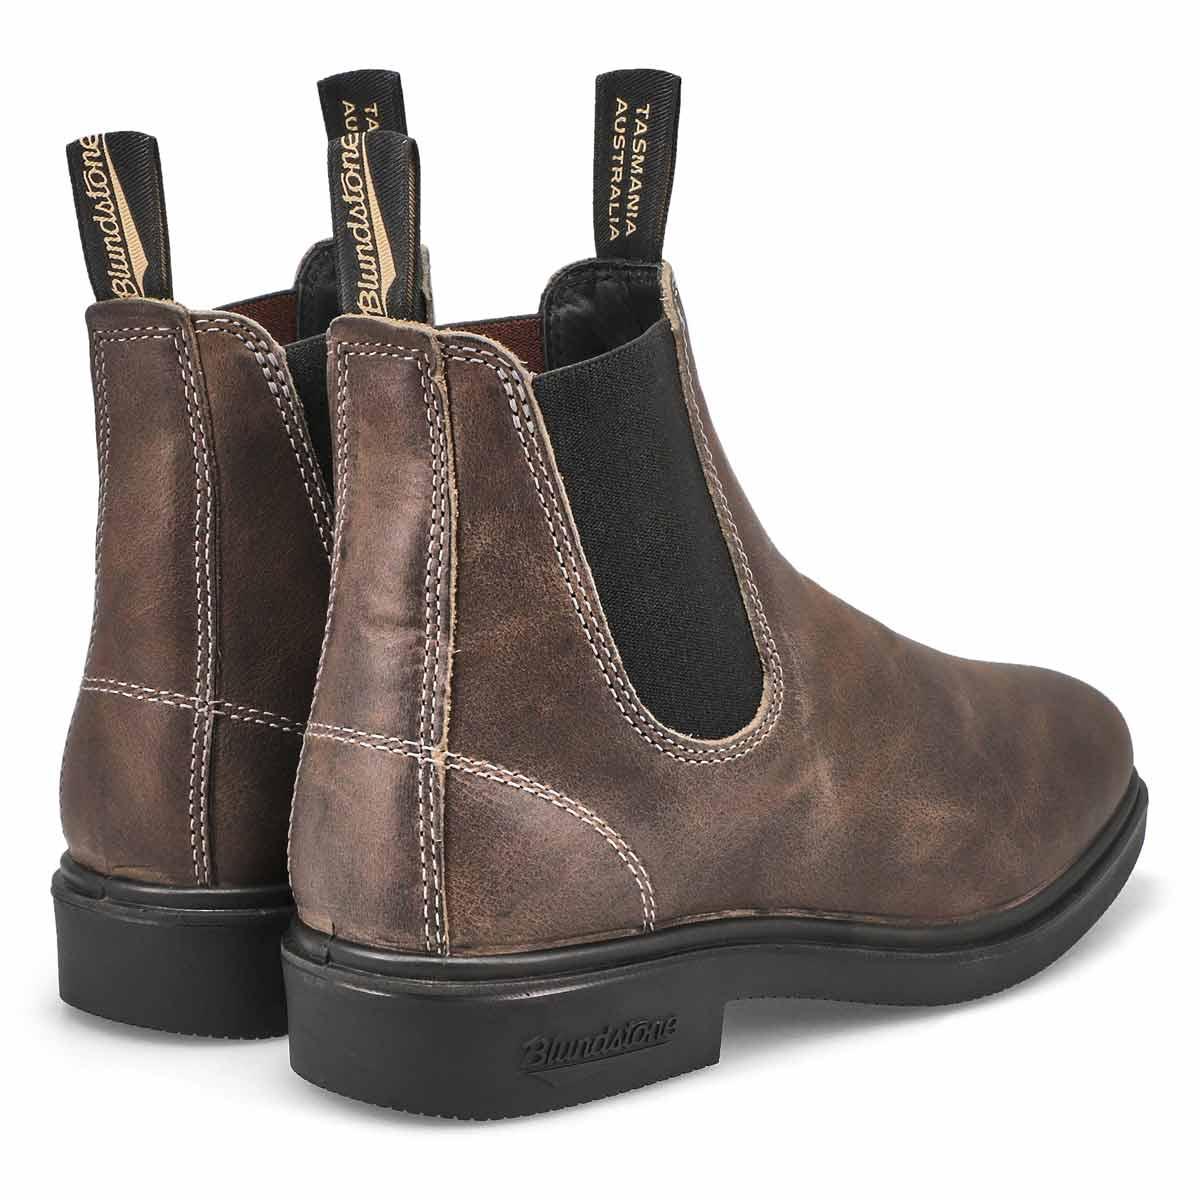 Unisex 1395 Chisel Toe Boot - Grey